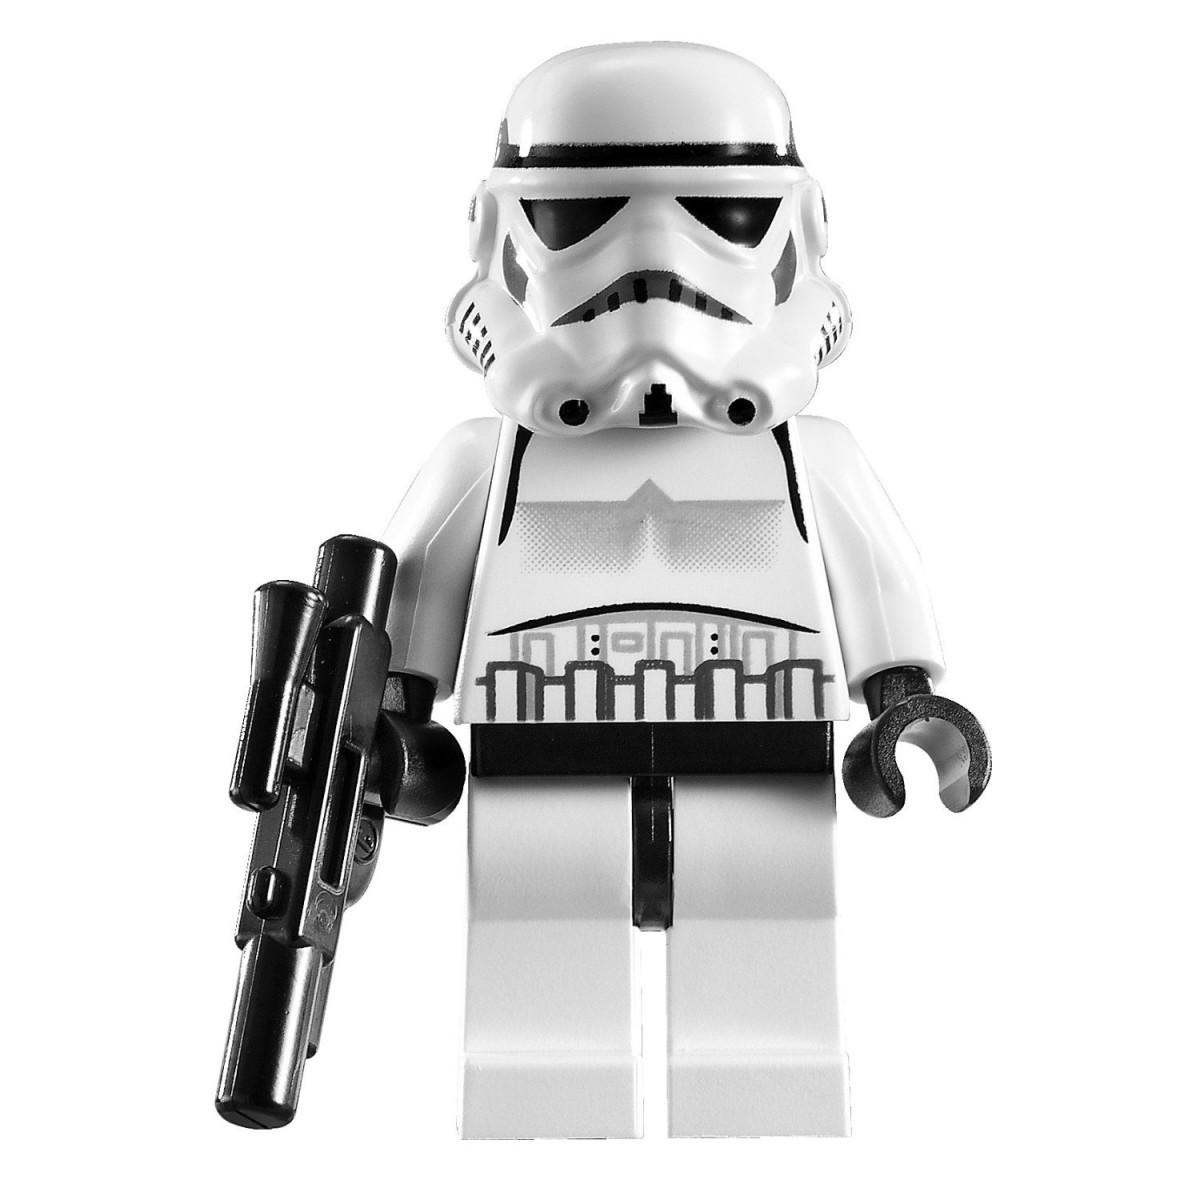 Coloriages imprimer lego num ro 490066 - Star wars personnages lego ...